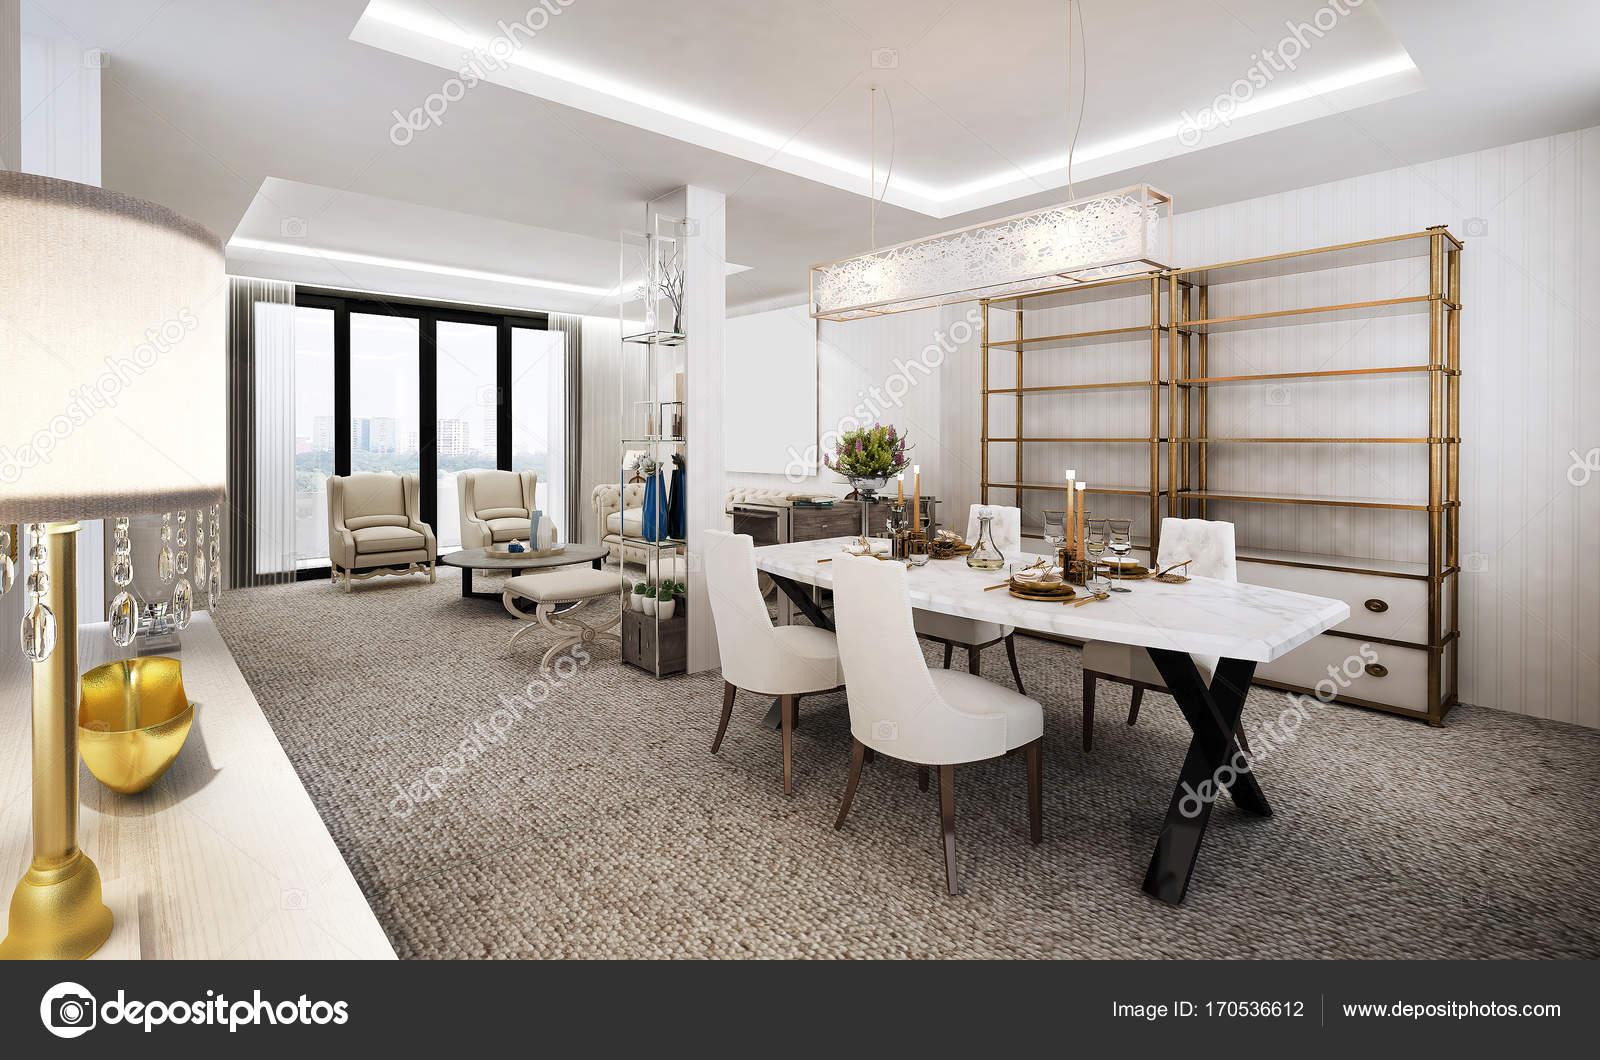 De luxe lounge en woonkamer interieur en de eetkamer — Stockfoto ...